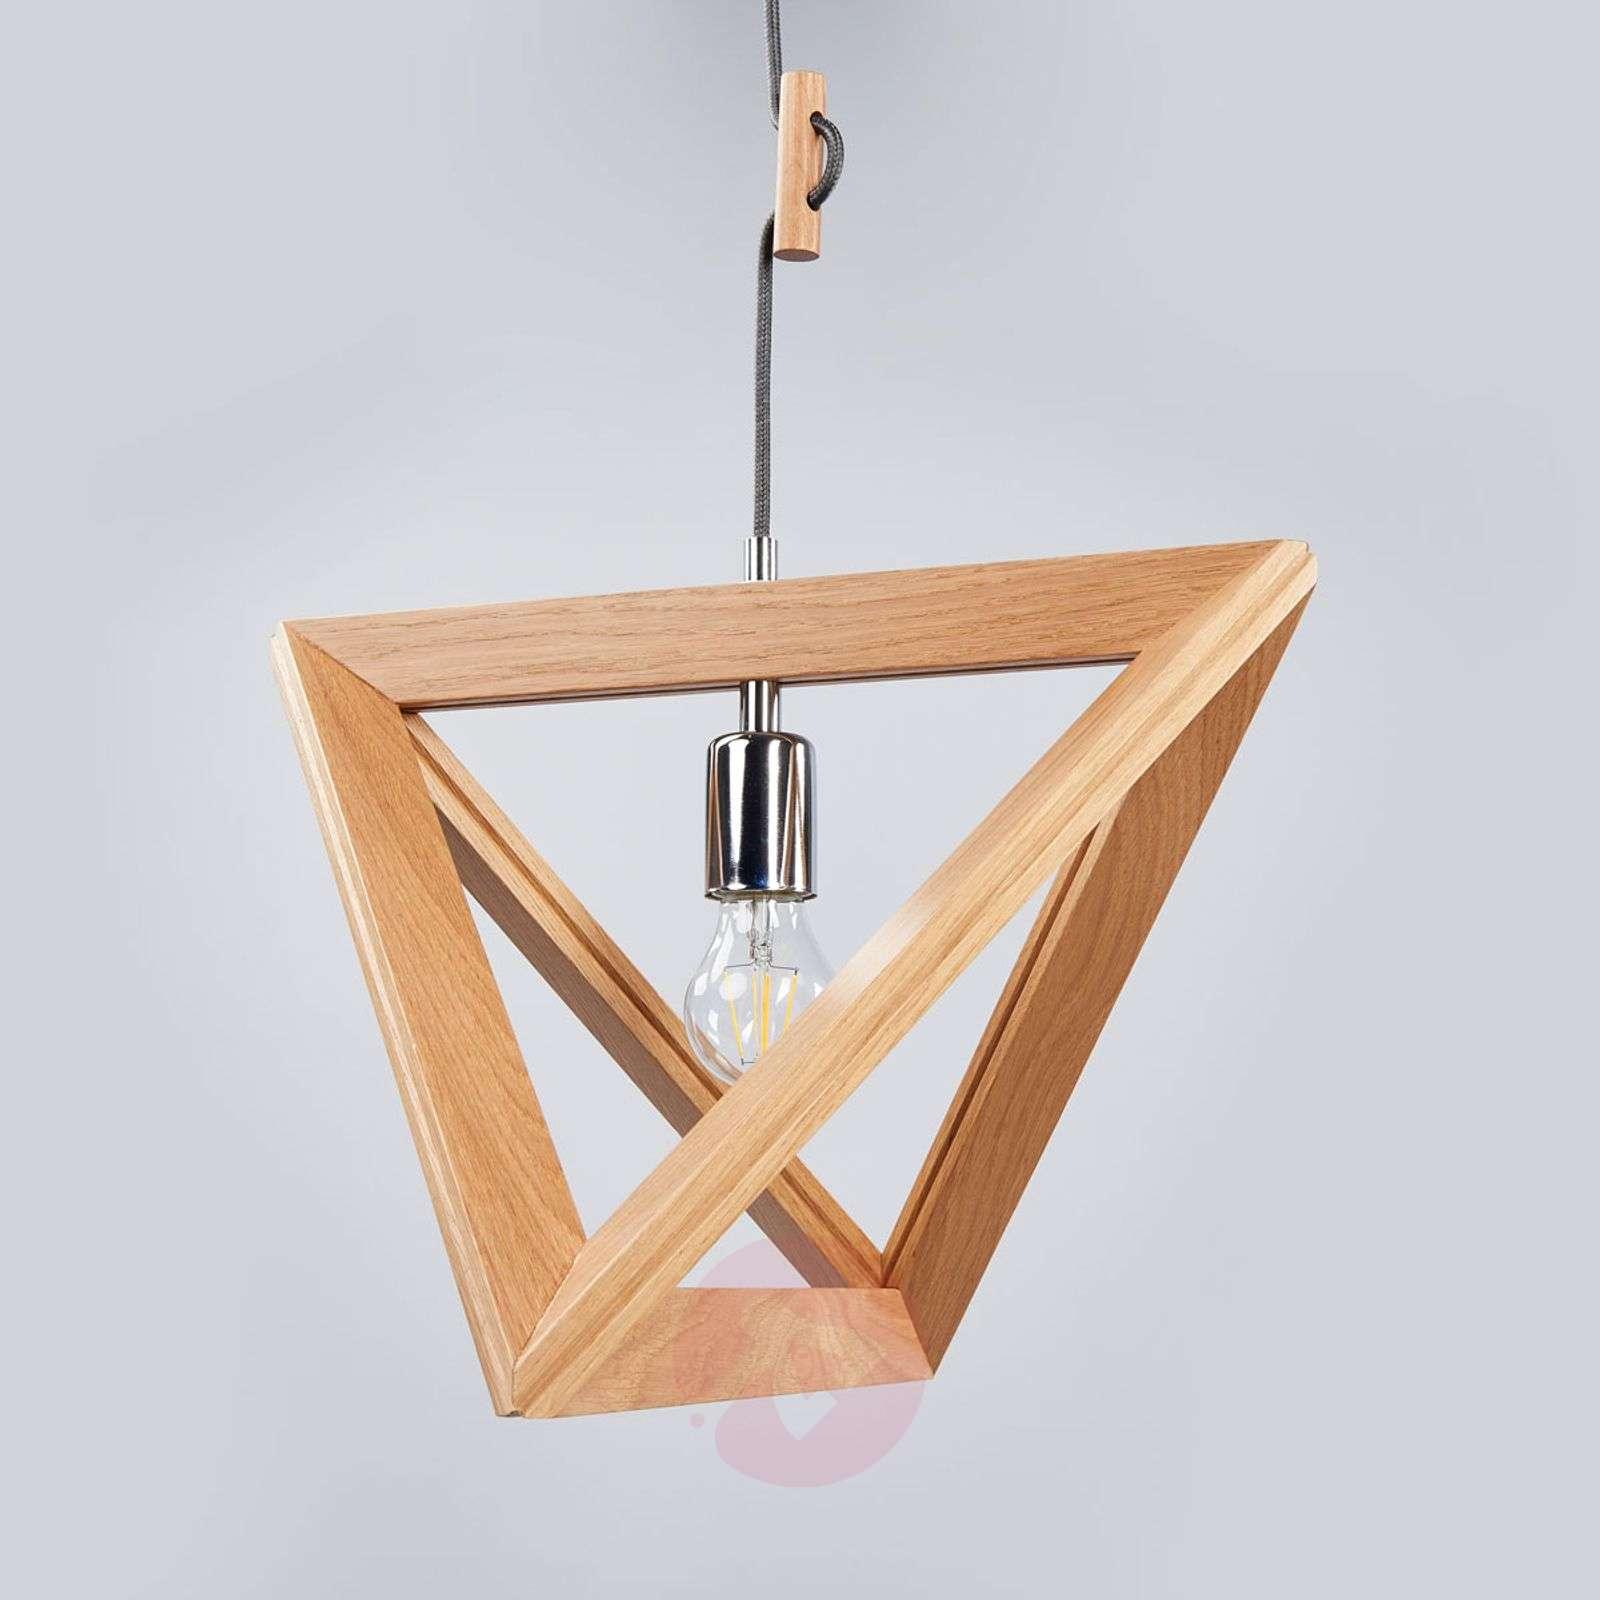 Wooden Trigonon pendant light-8574256-01